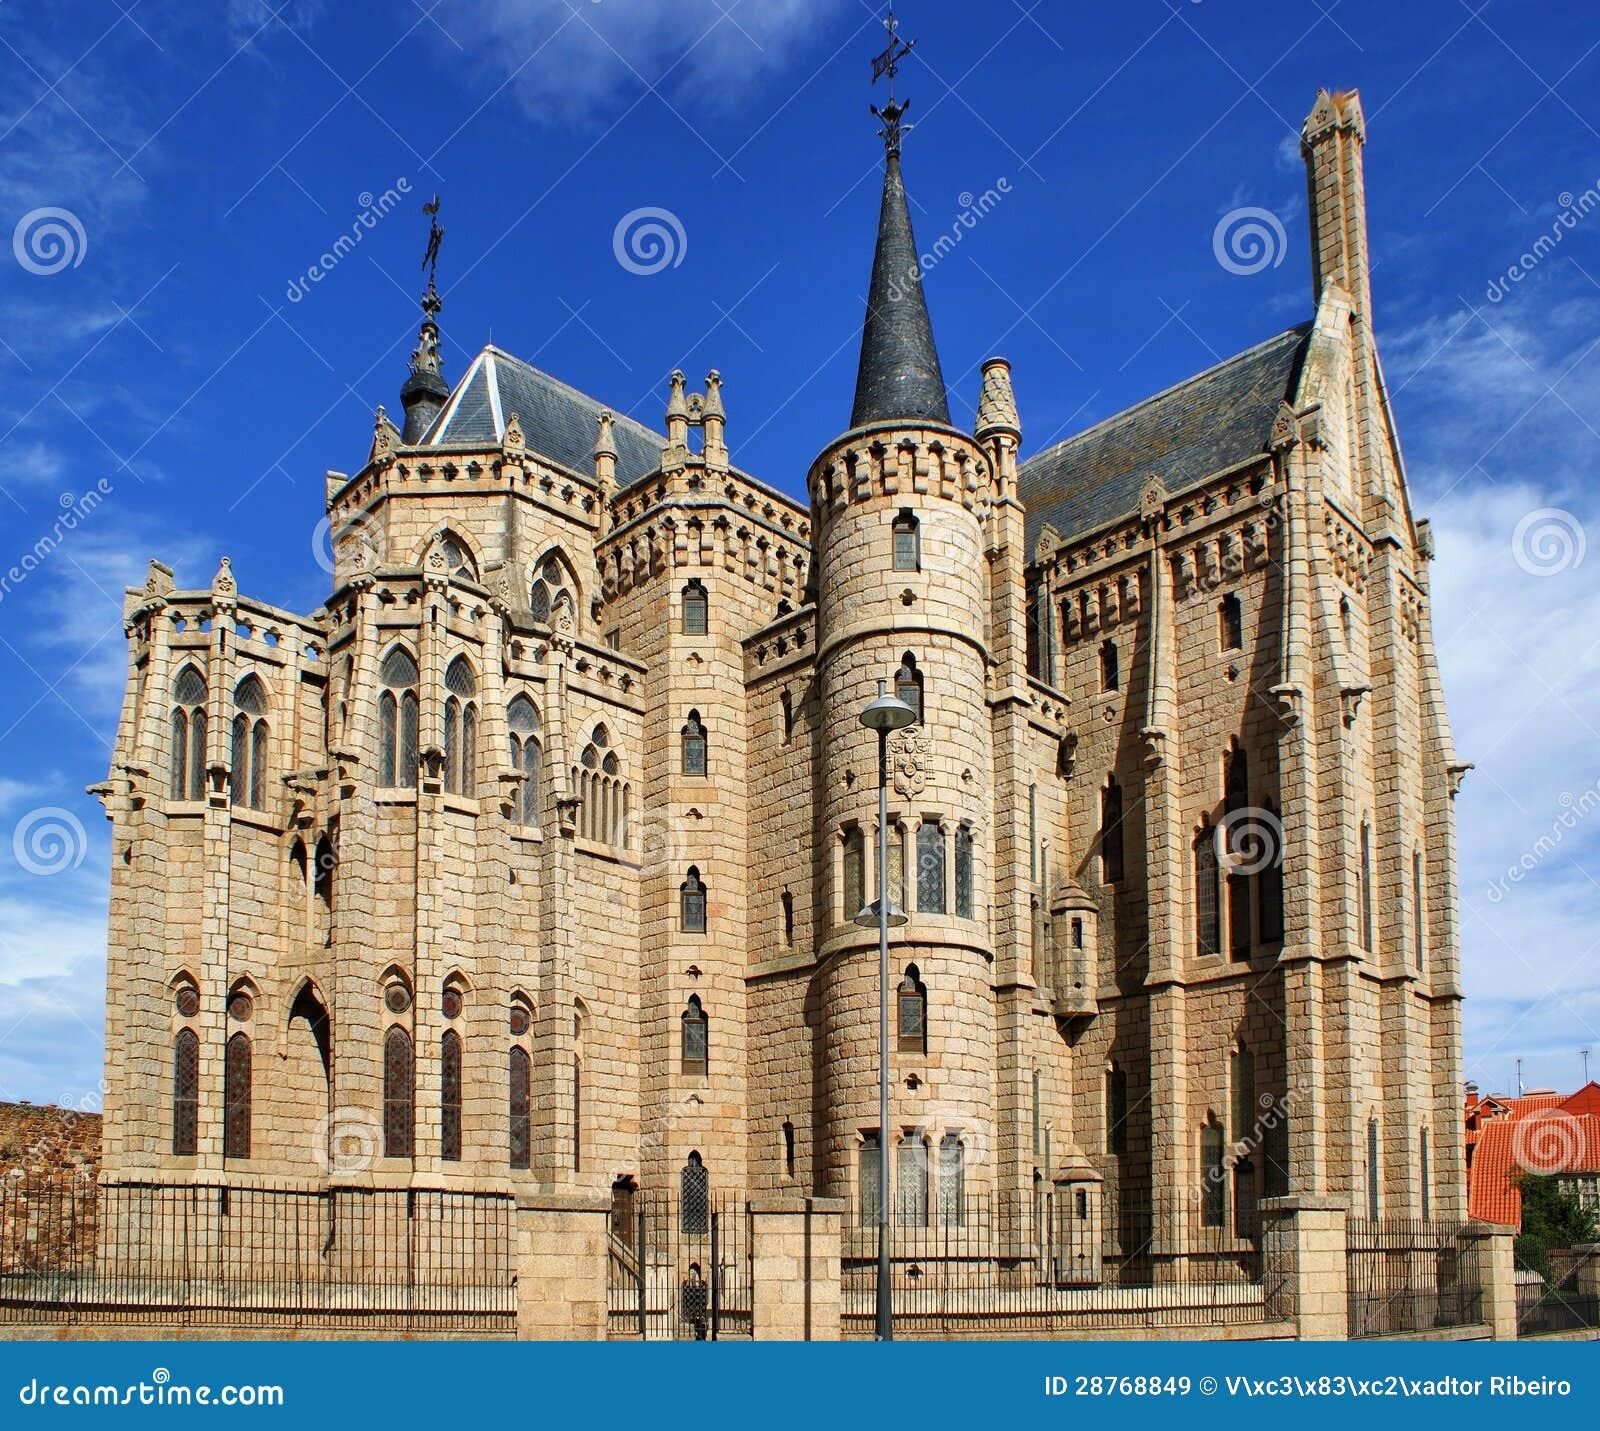 Episcopal Palace in Astorga